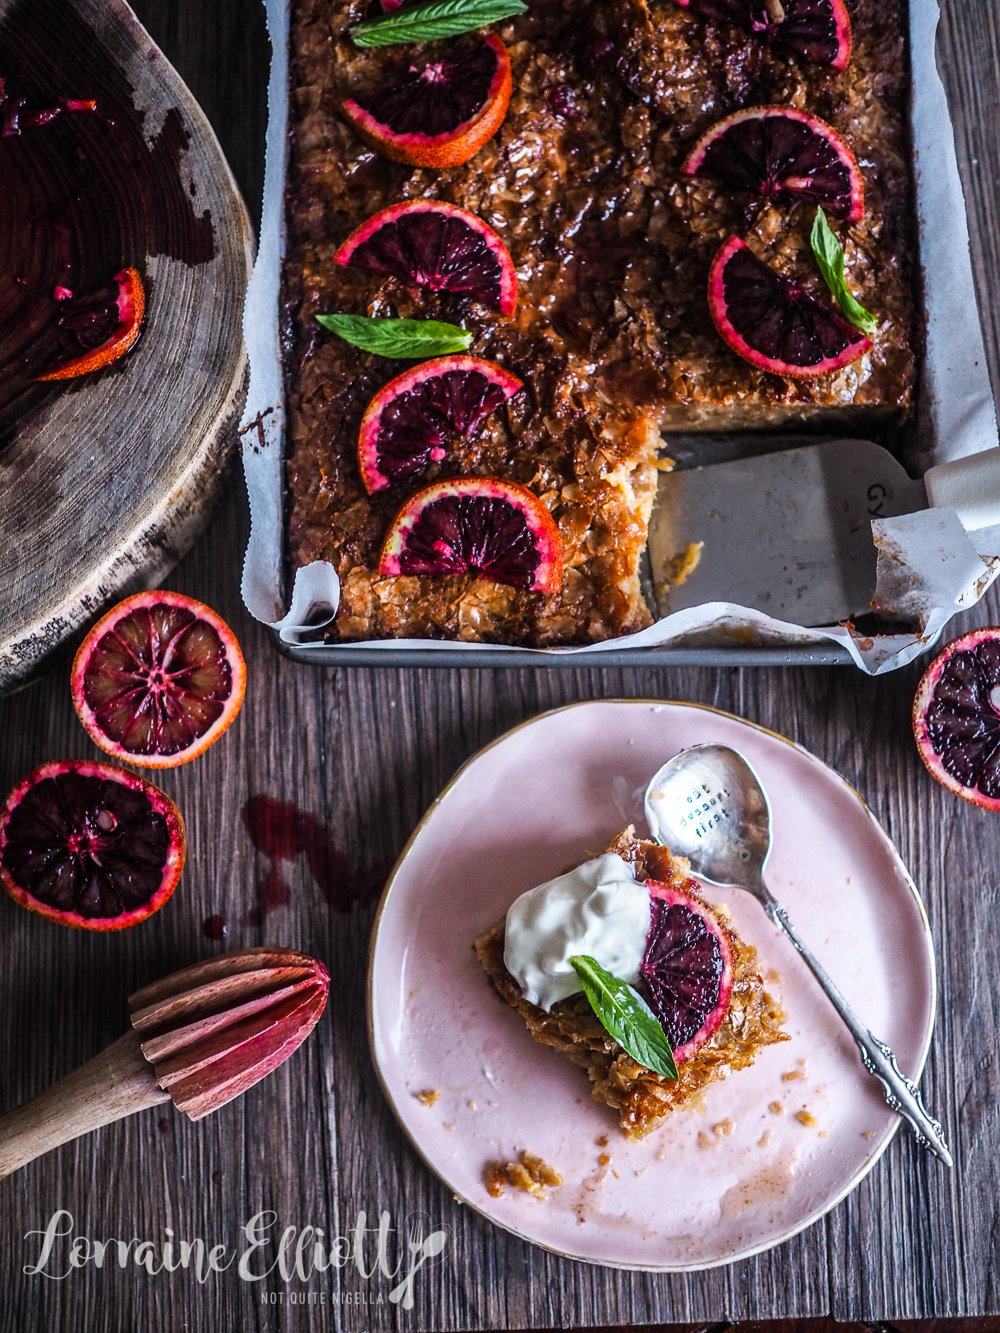 Top 5 Blood Orange Recipes